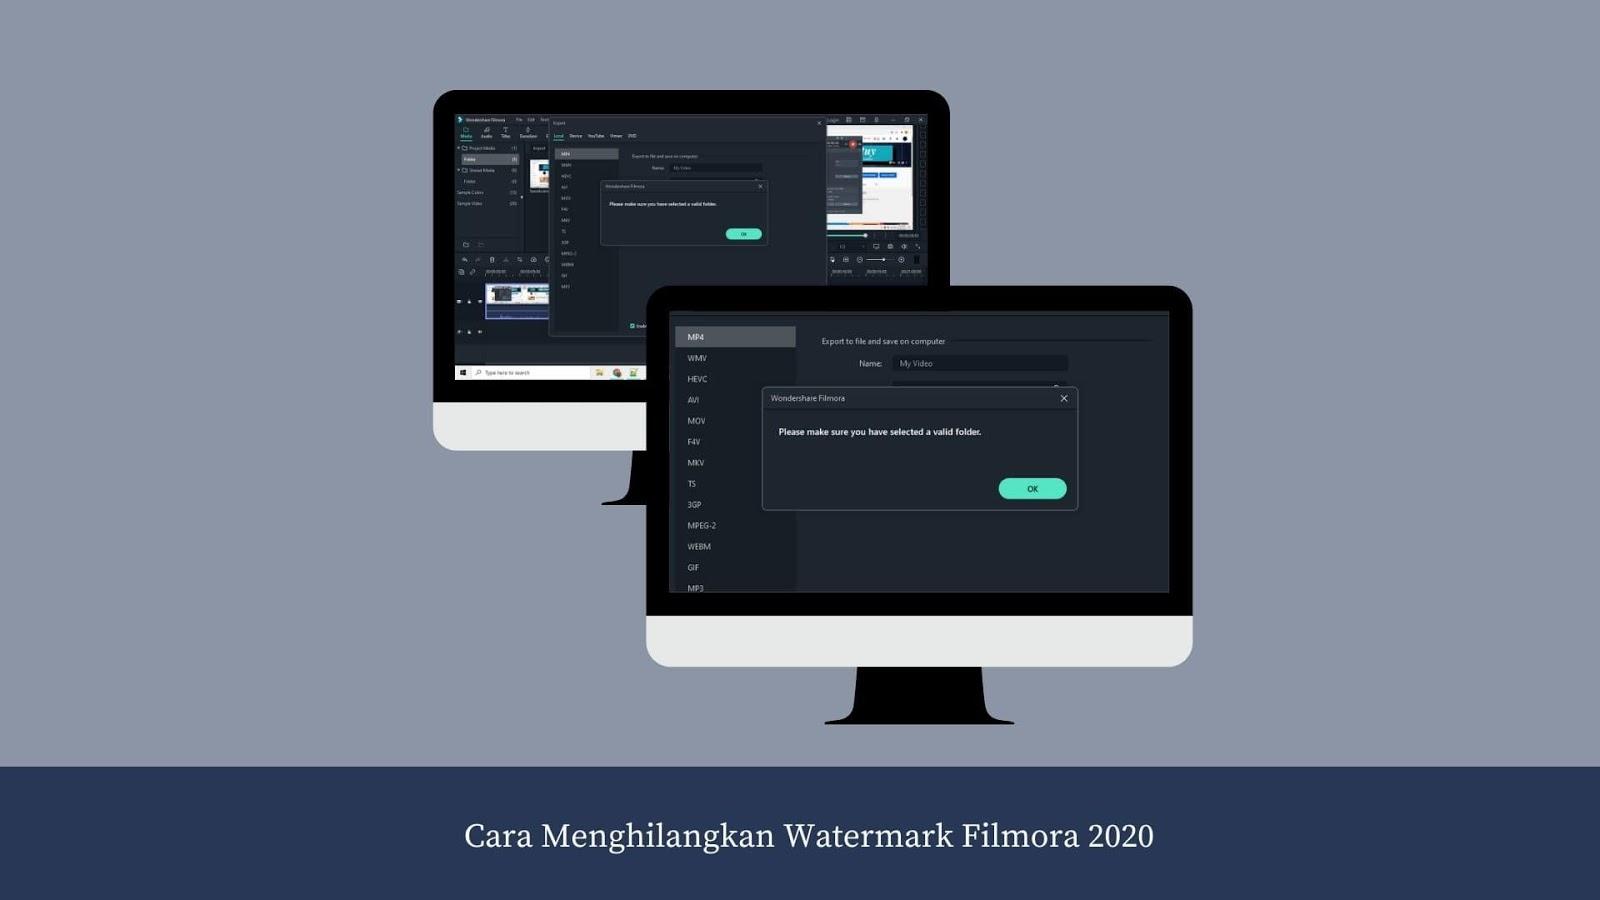 Cara Menghilangkan Watermark Filmora 2020